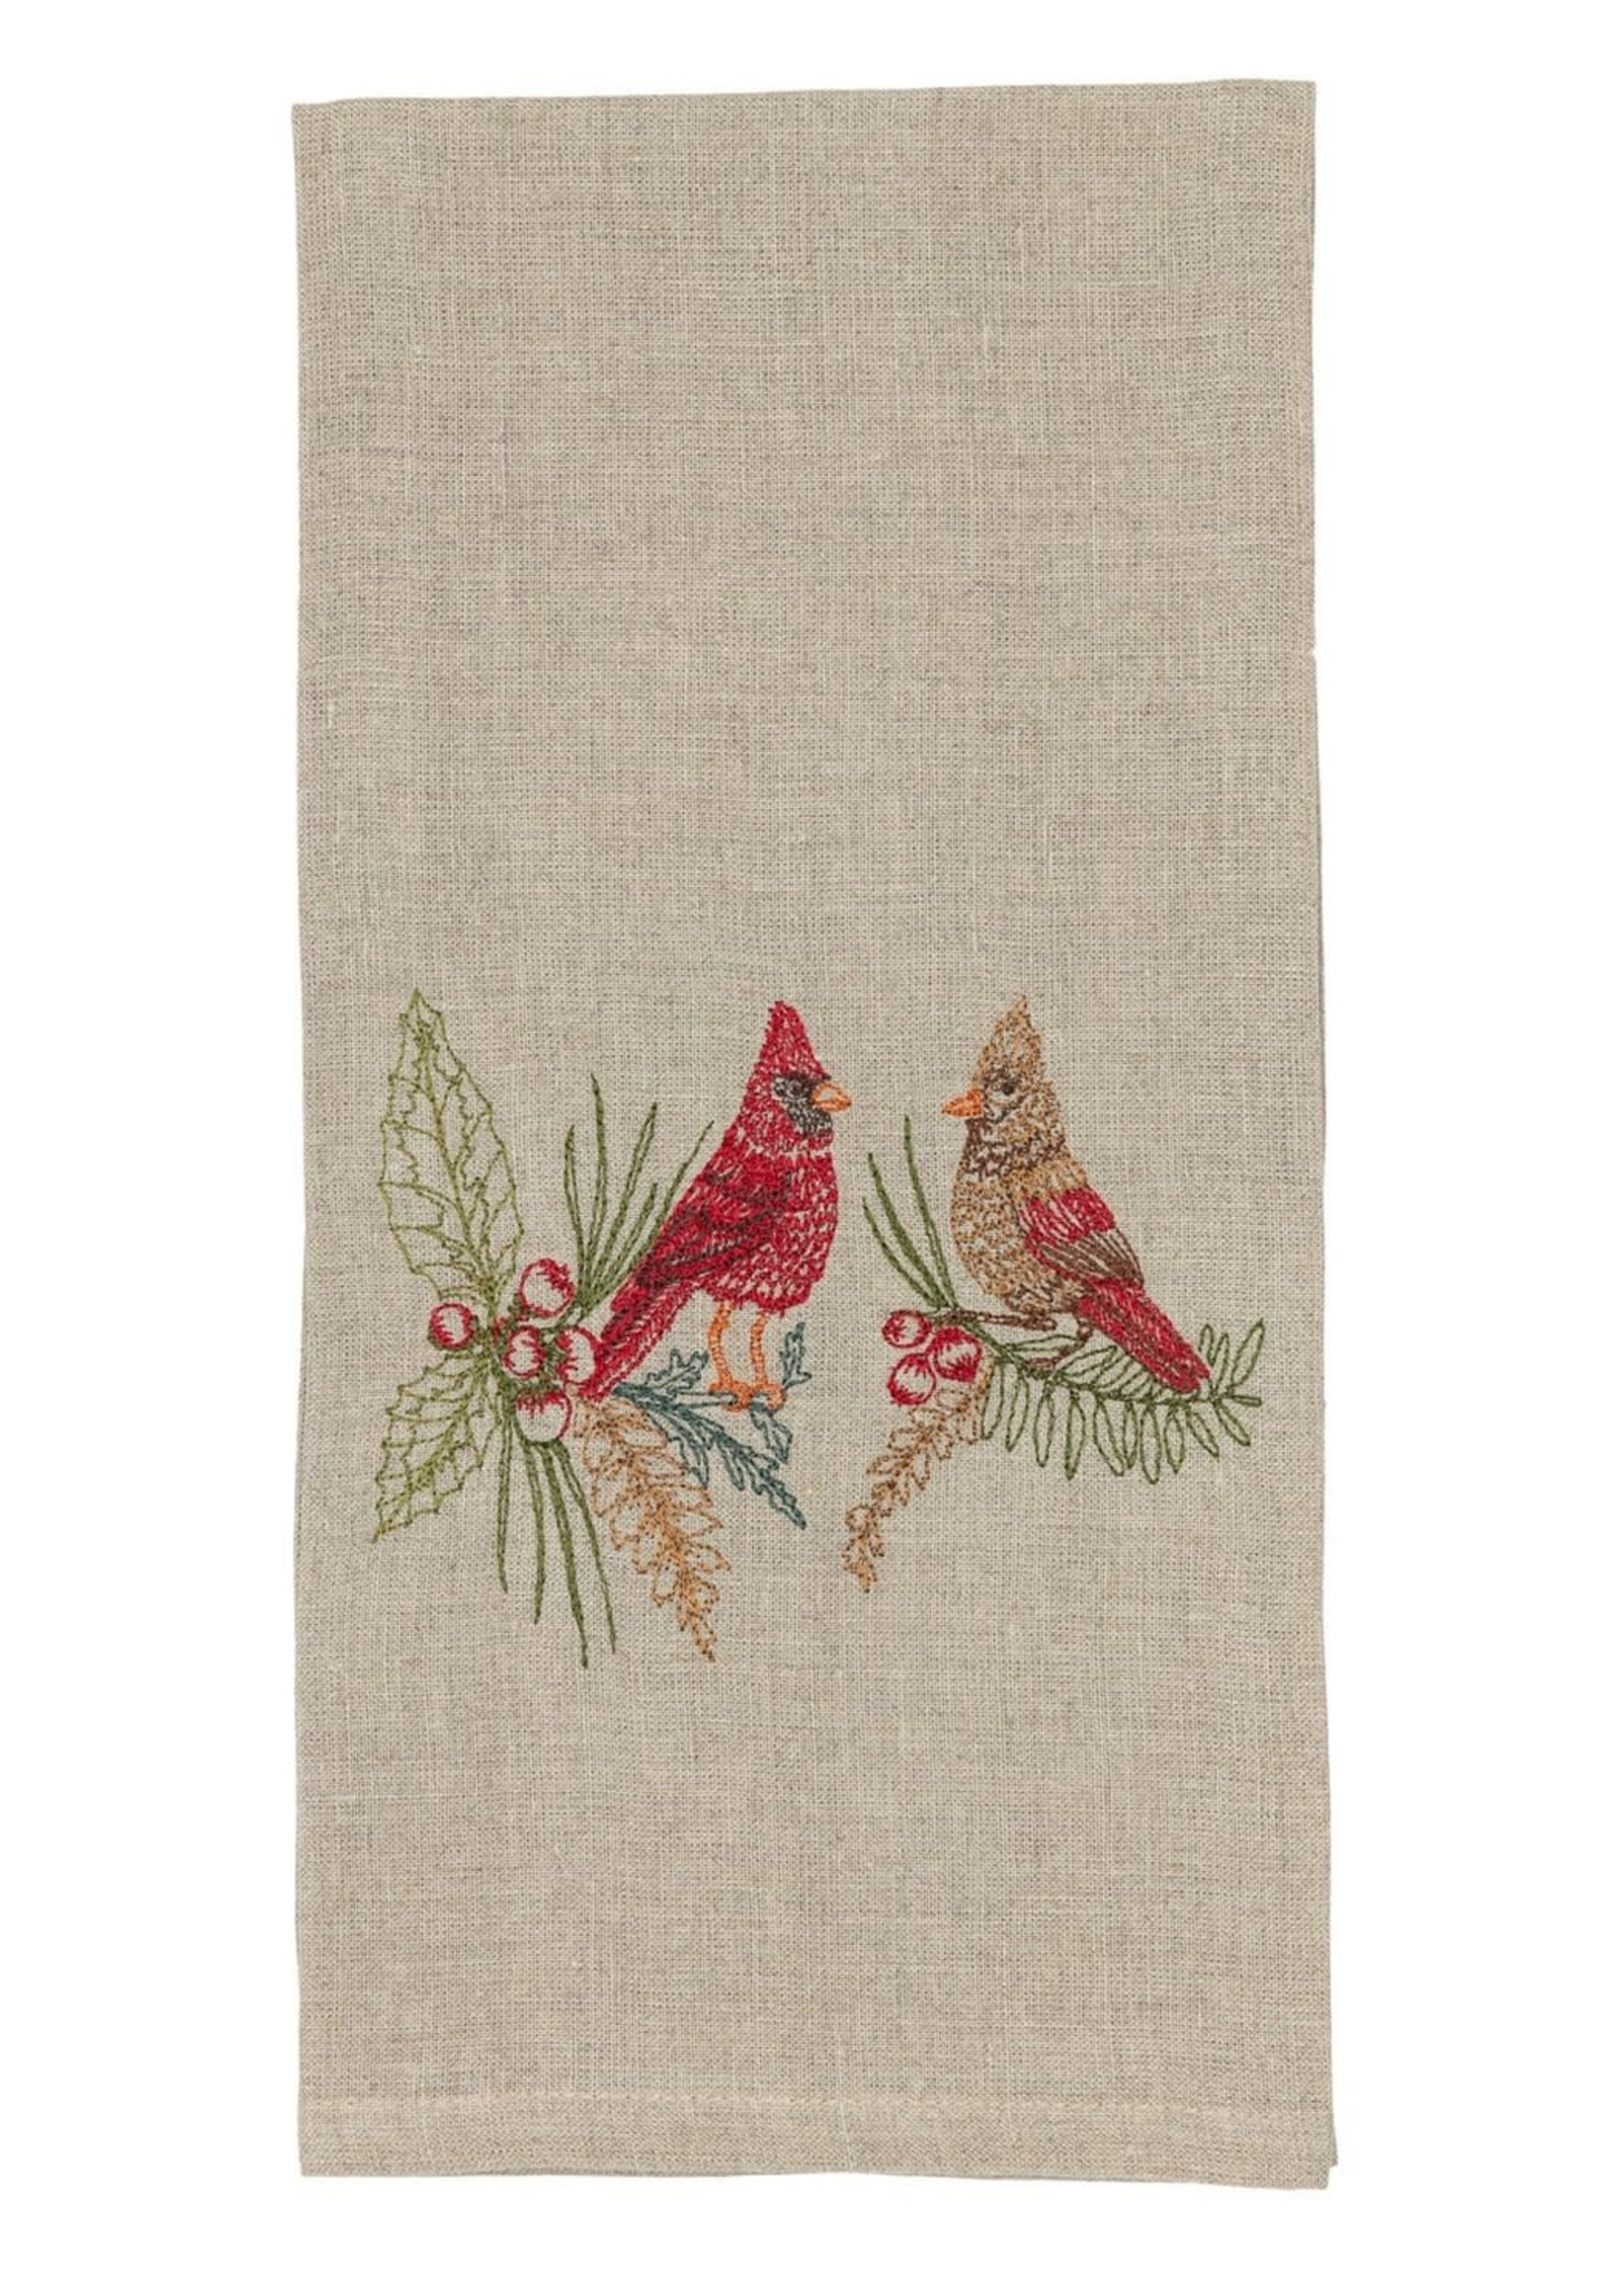 Coral and Tusk Towel - Christmas Cardinals